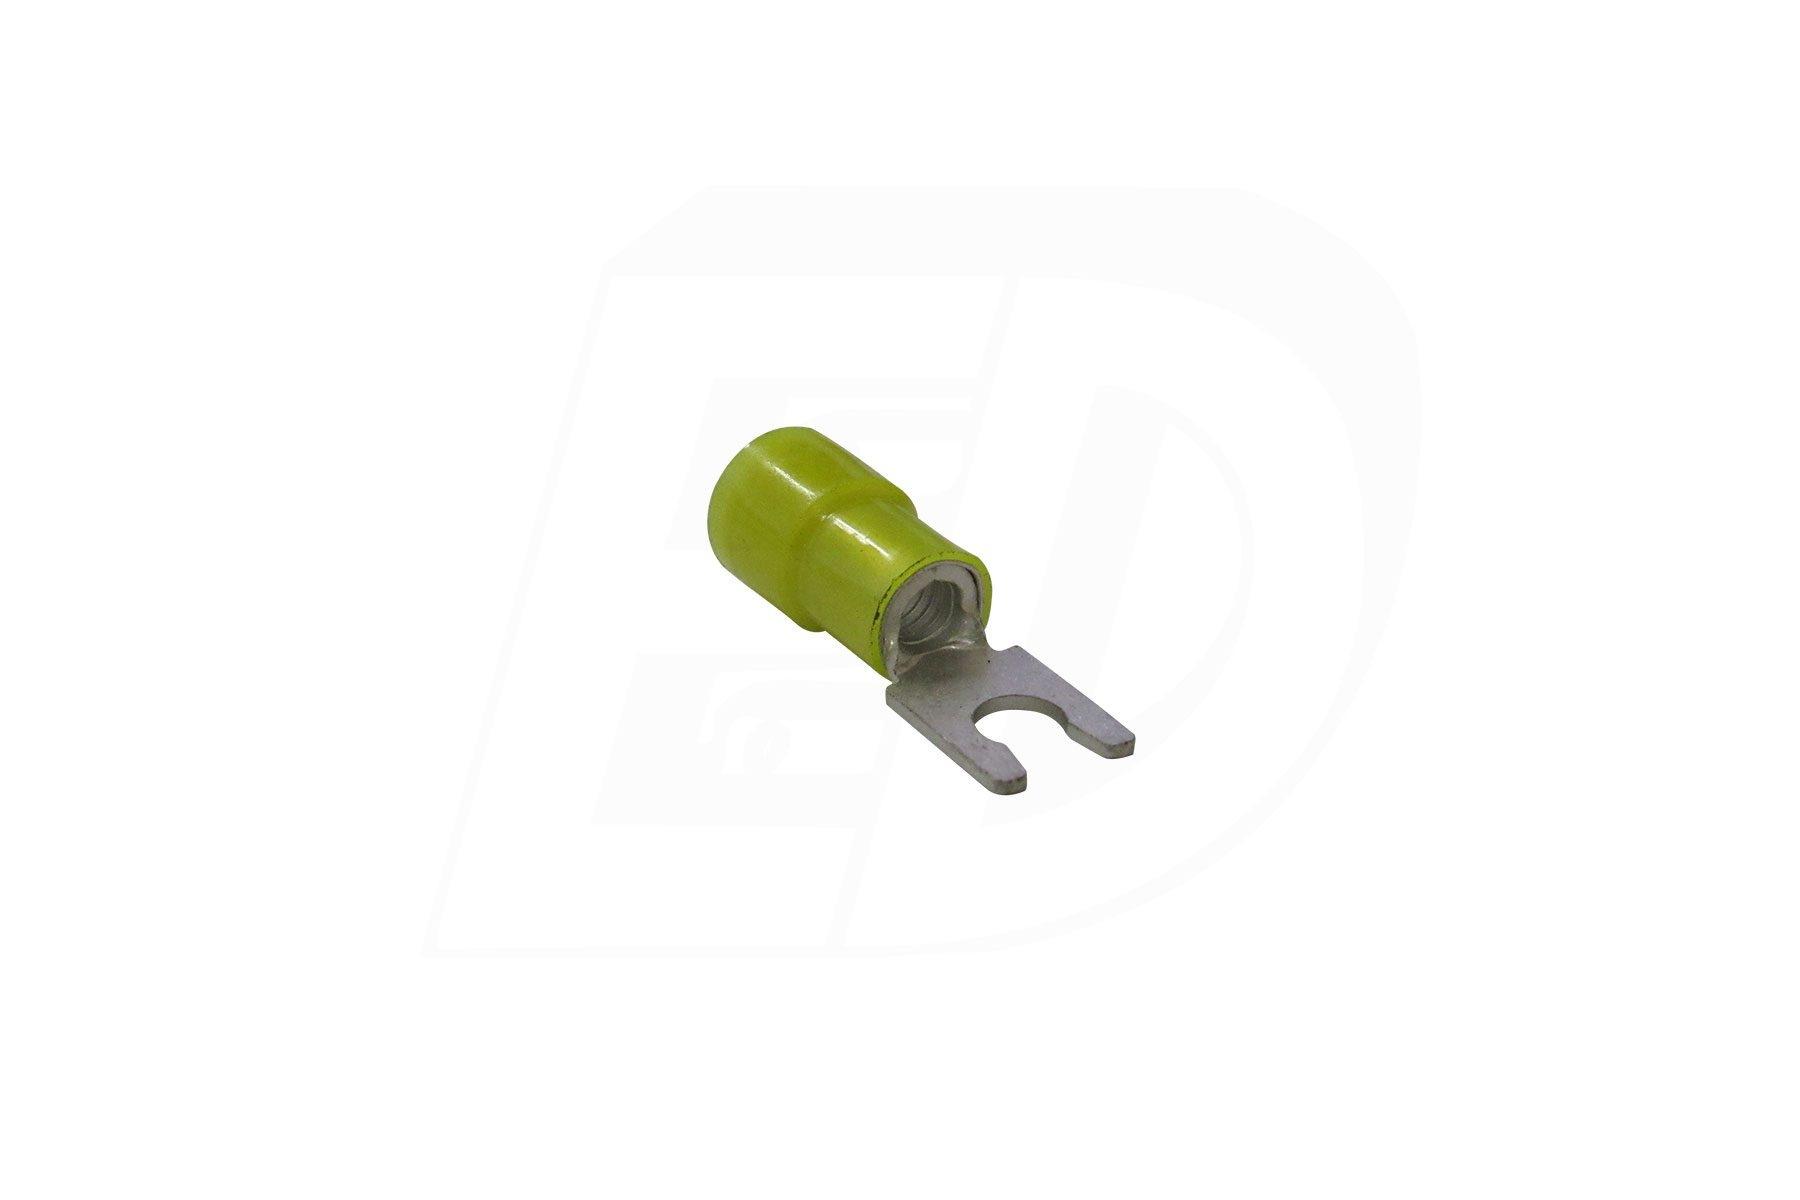 Locking spade terminal with tin plated locking sleeve 12 - 10 AWG